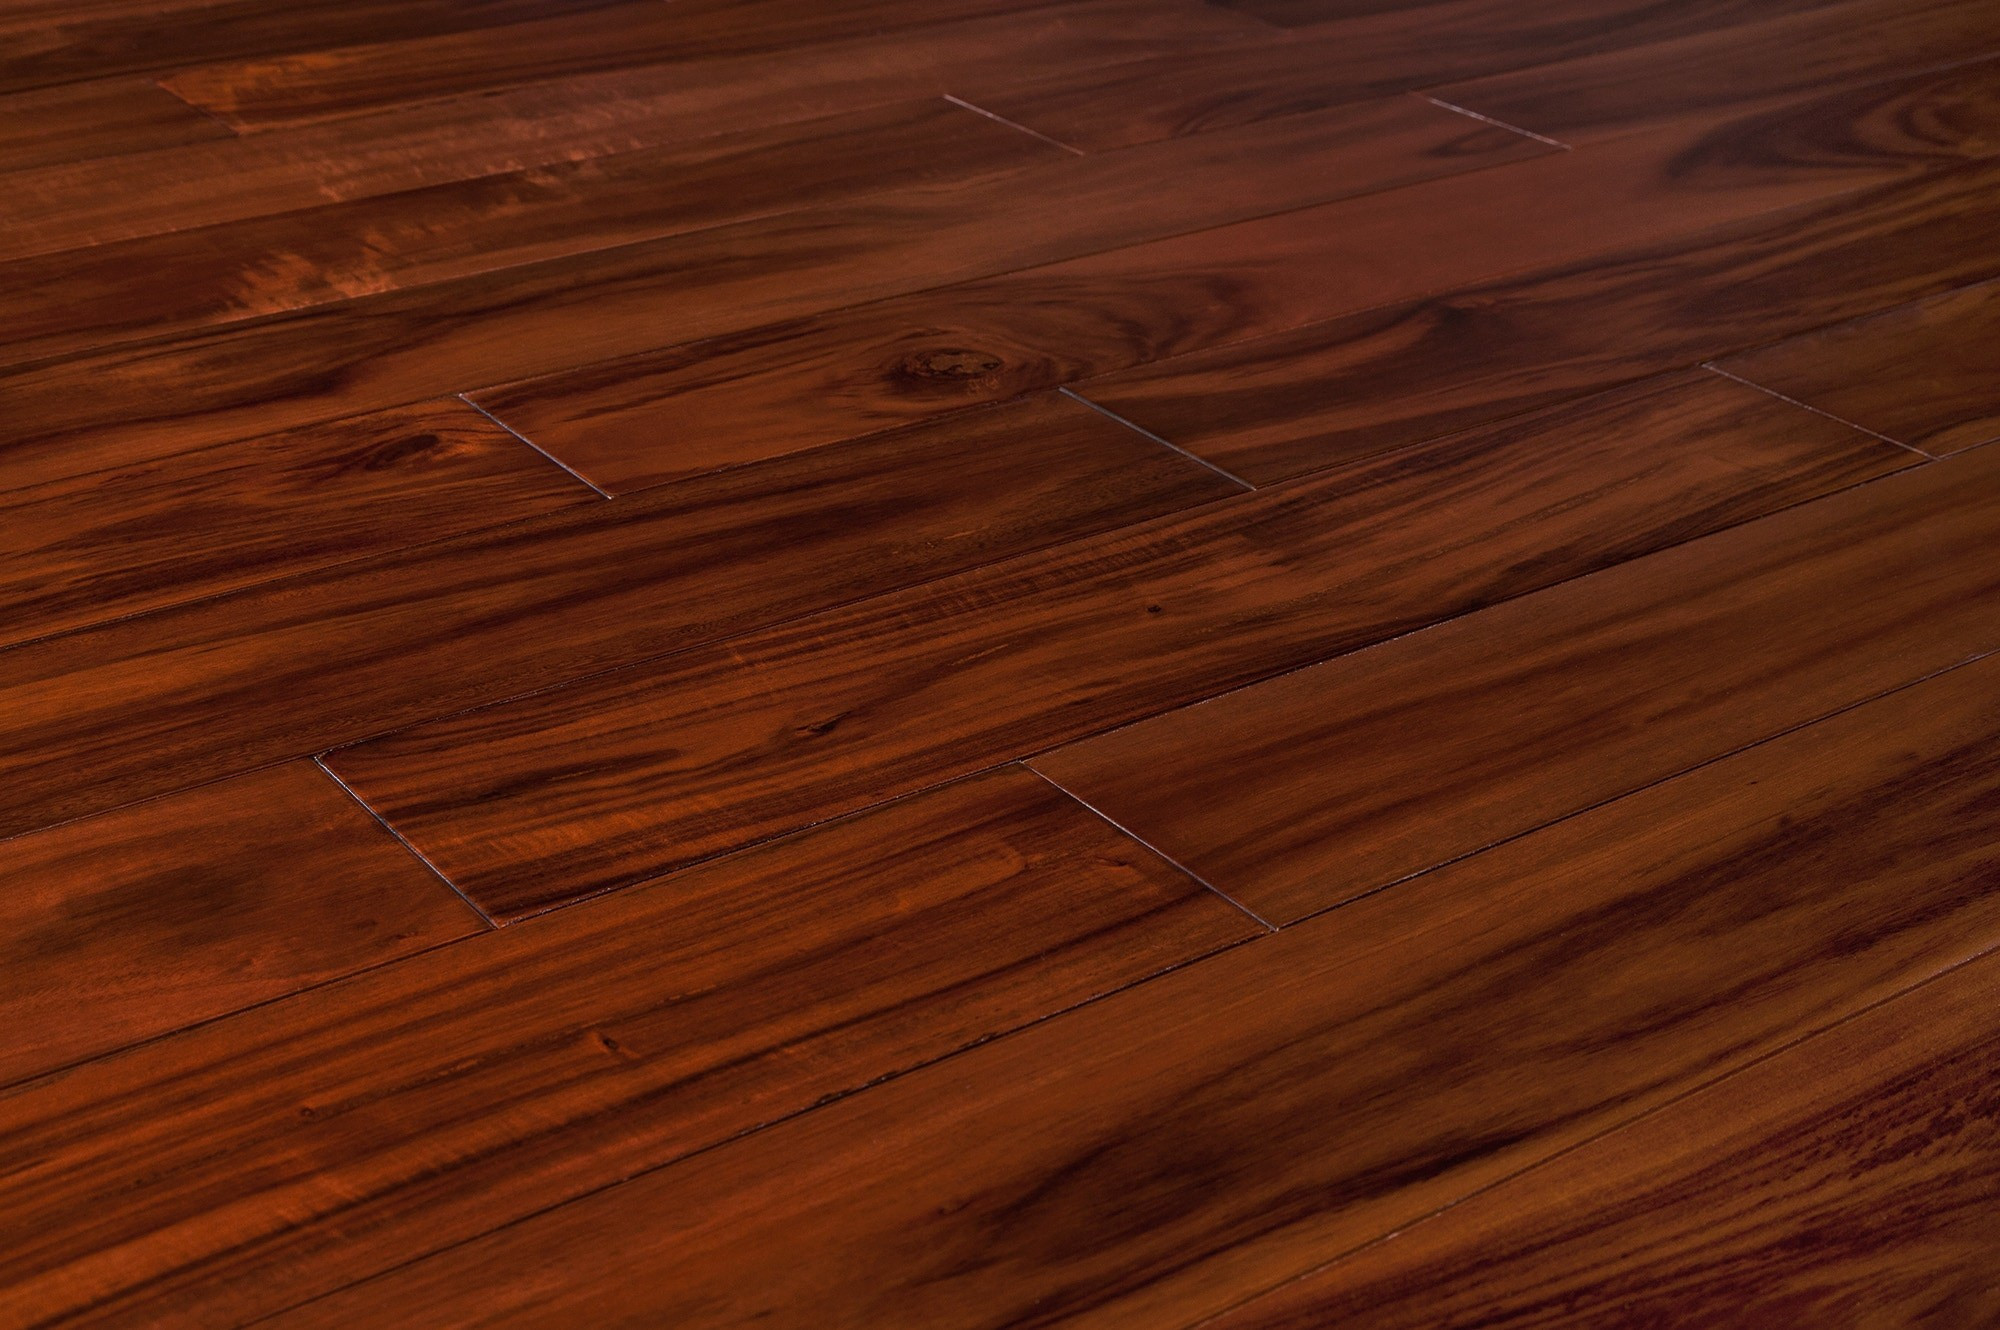 hand scraped hardwood flooring sale of 14 unique acacia solid hardwood flooring pics dizpos com with acacia solid hardwood flooring new clearance wood flooring house unique wide plank solid hardwood with photograph